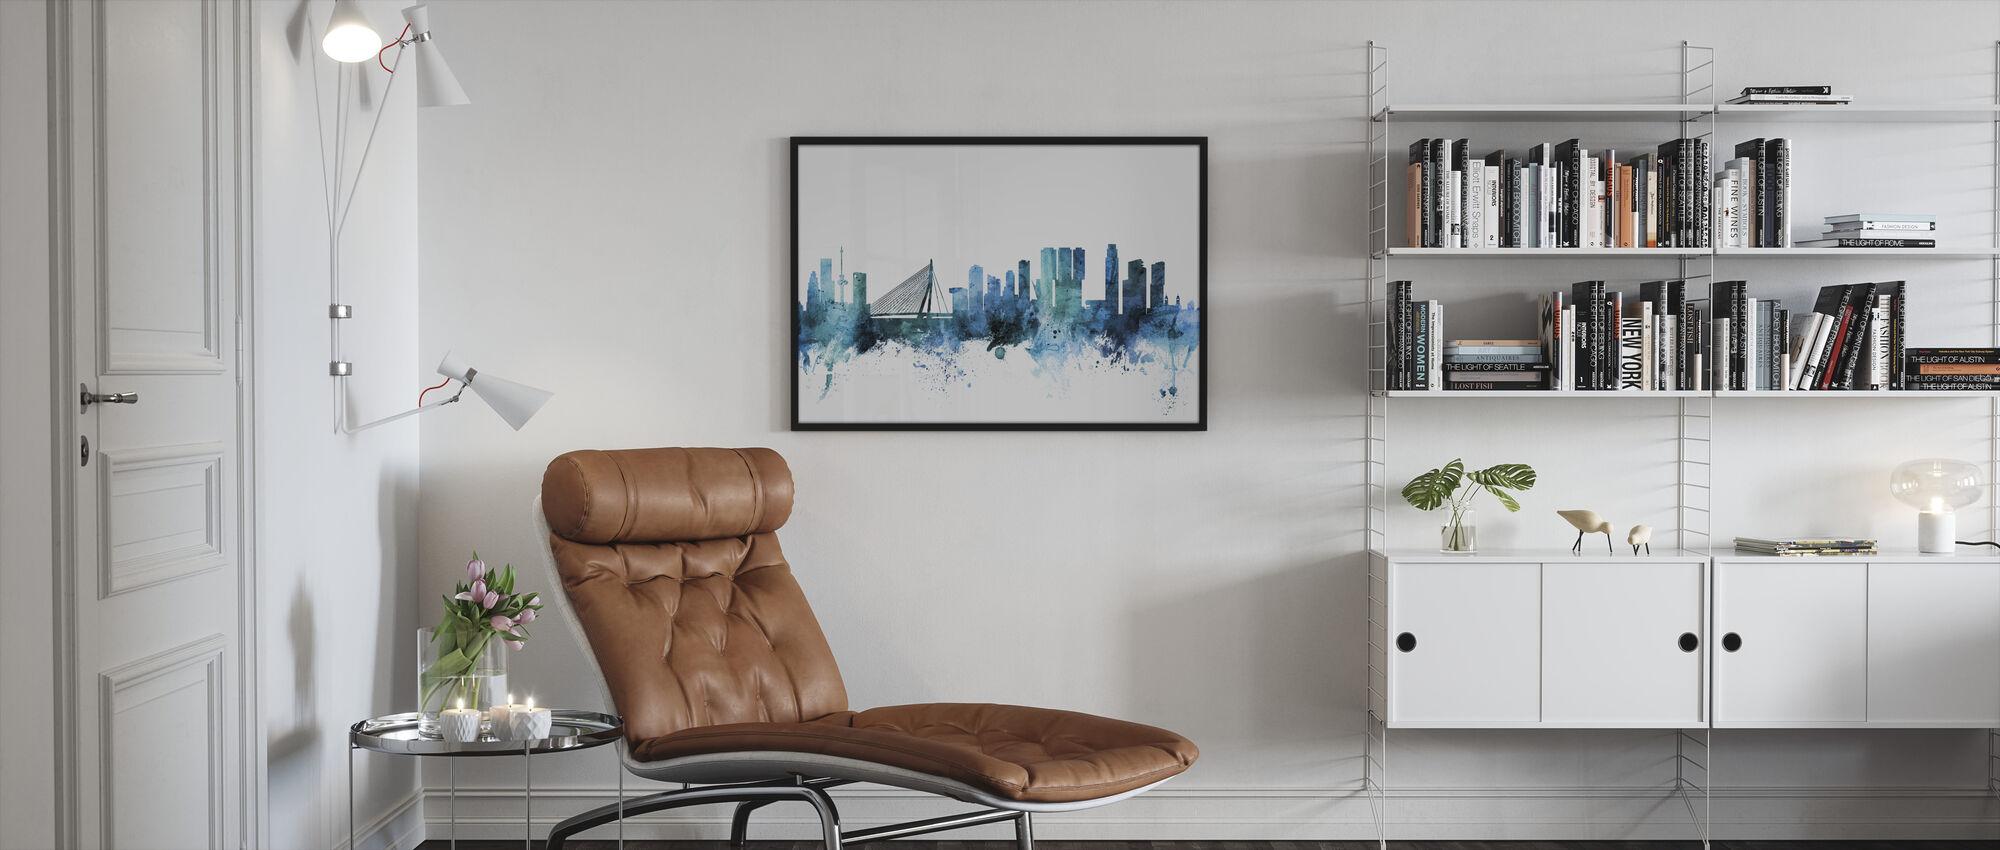 Rotterdam The Netherlands Skyline - Framed print - Living Room